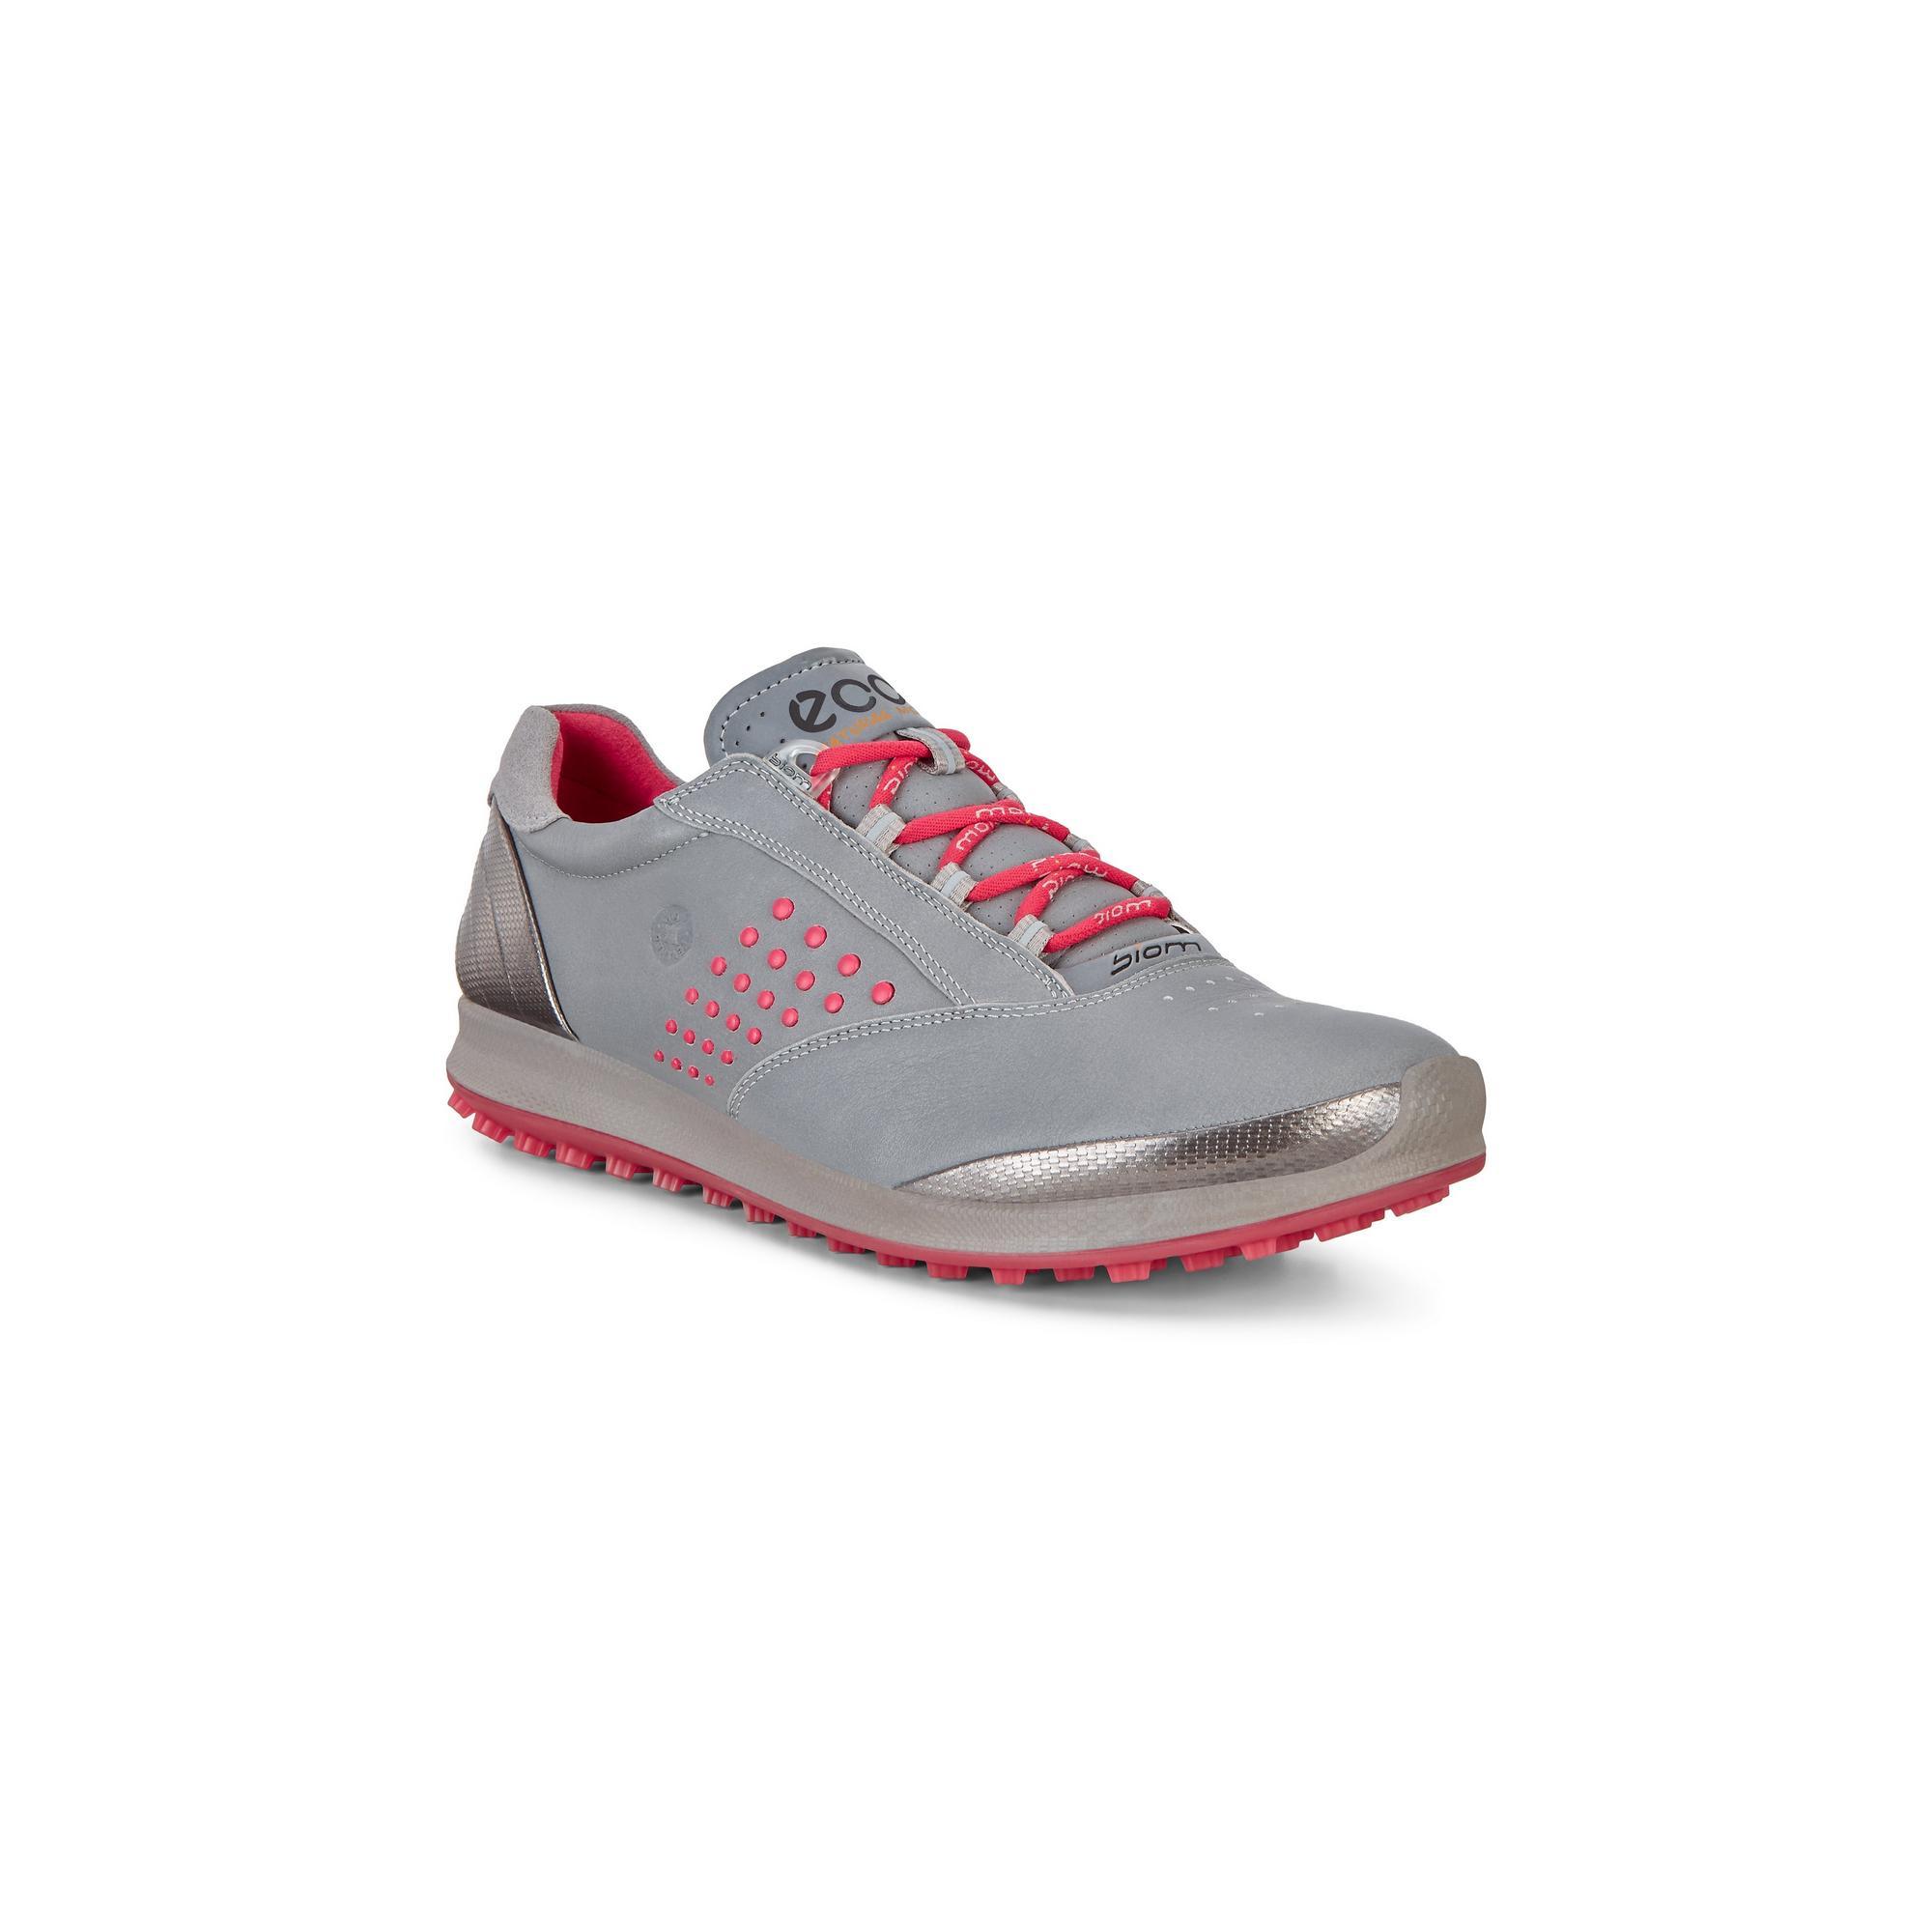 Women's Biom Hybrid 2 Spikeless Golf Shoe - Grey/Pink